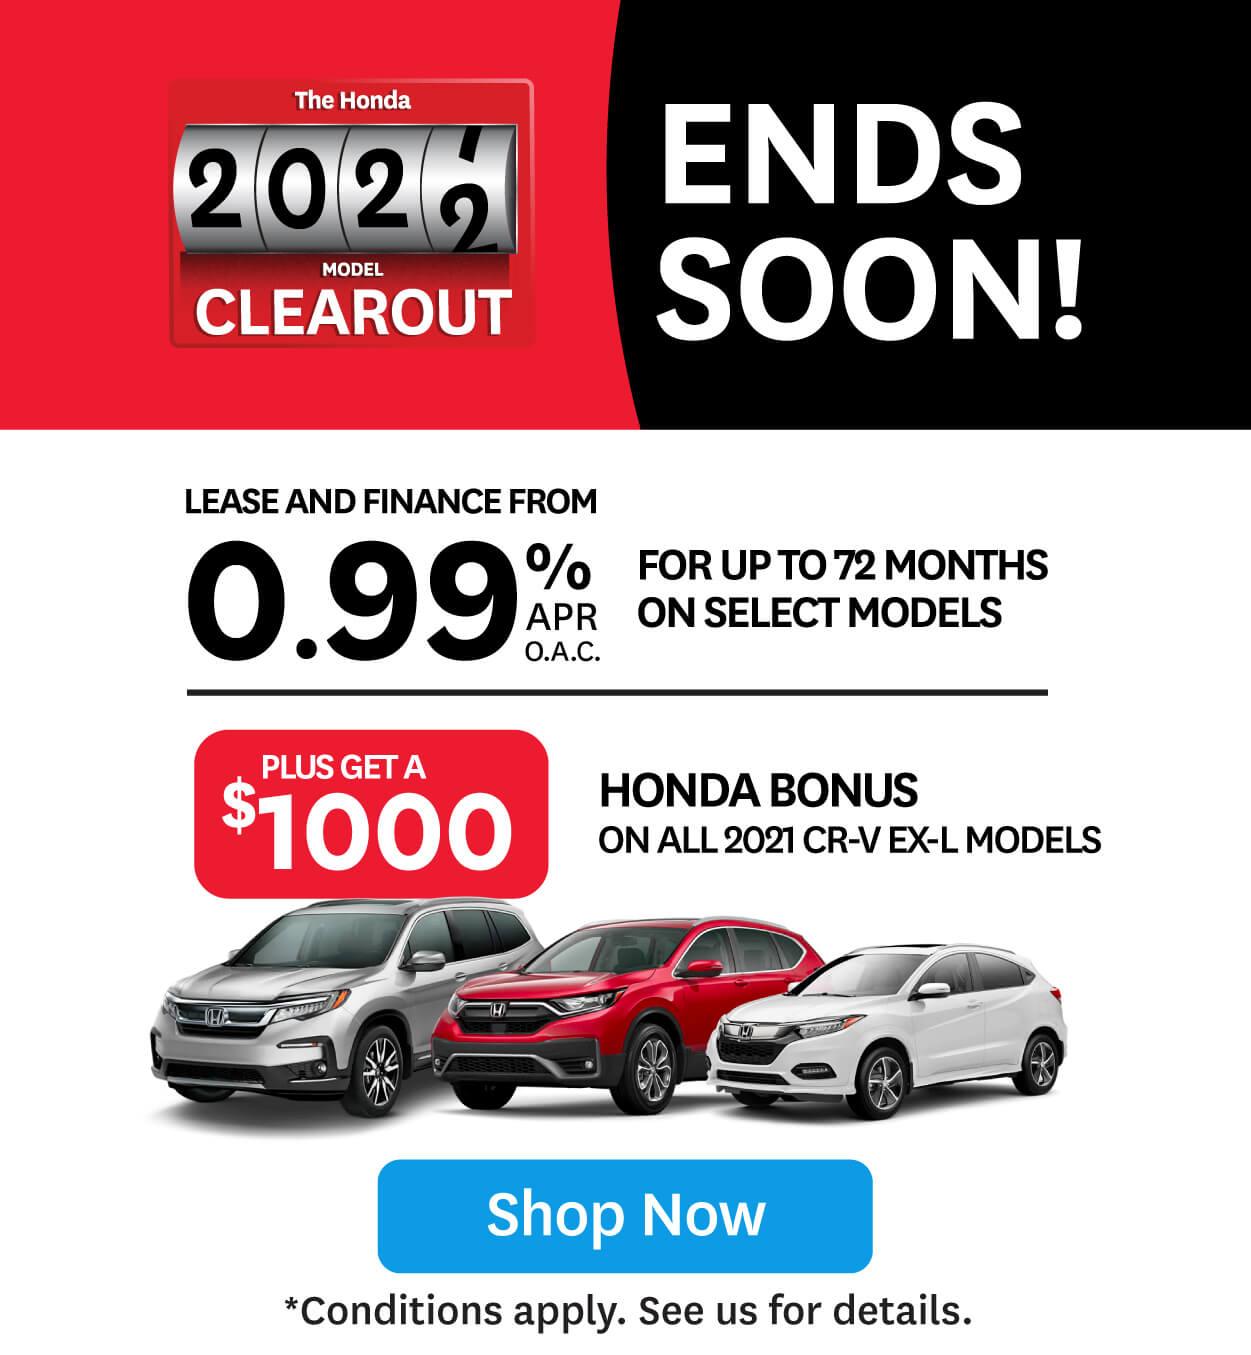 Orangeville Honda 2021 Model Clearout